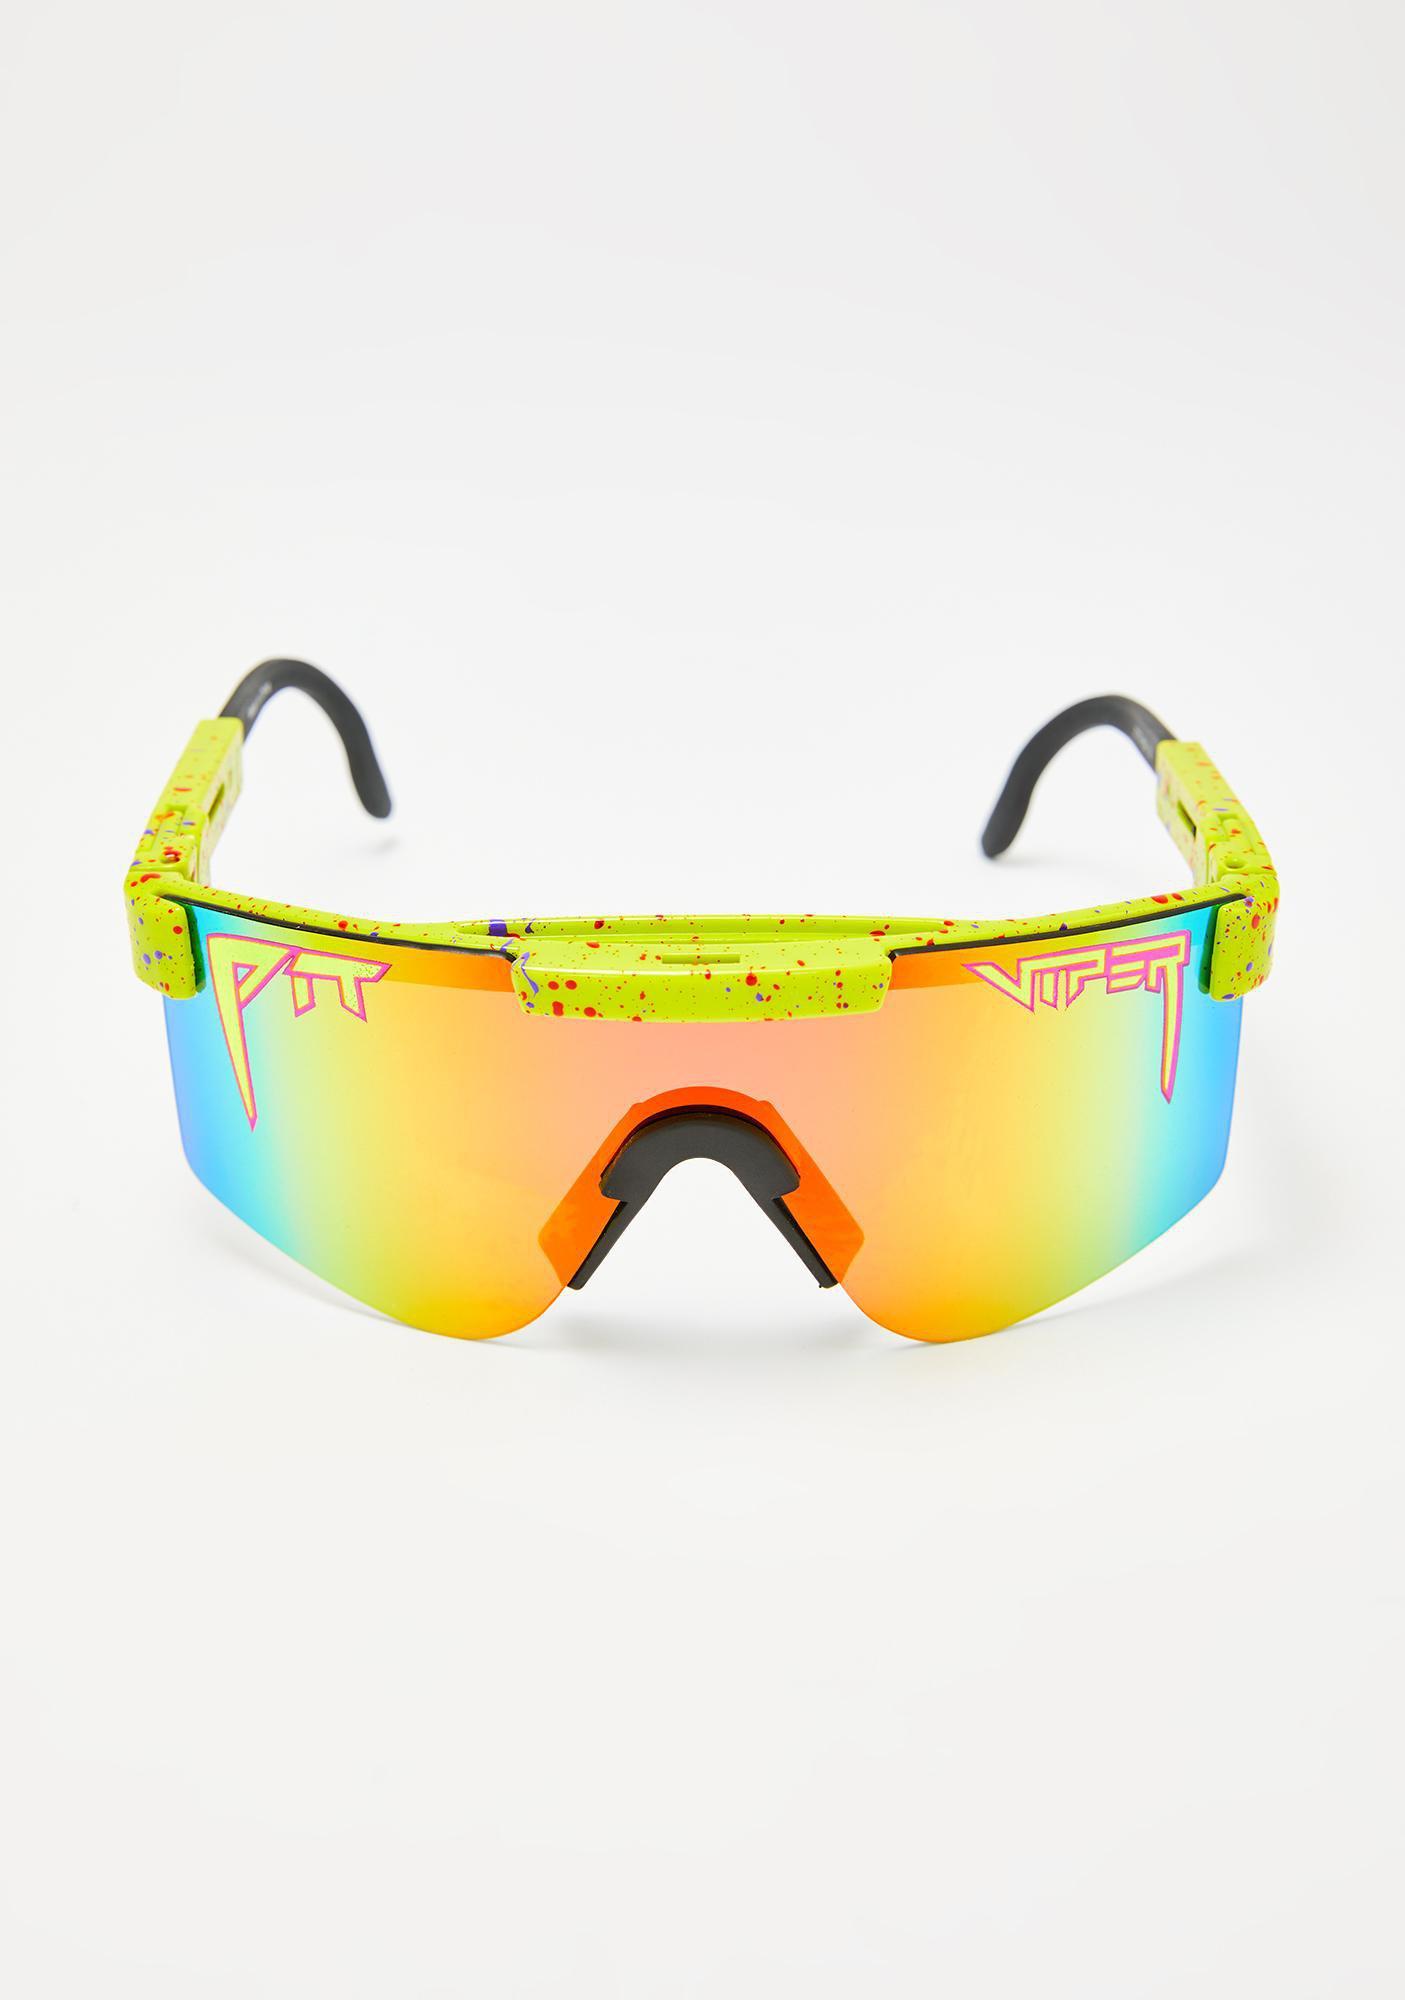 Pit Viper The 1993 Polarized Sunglasses